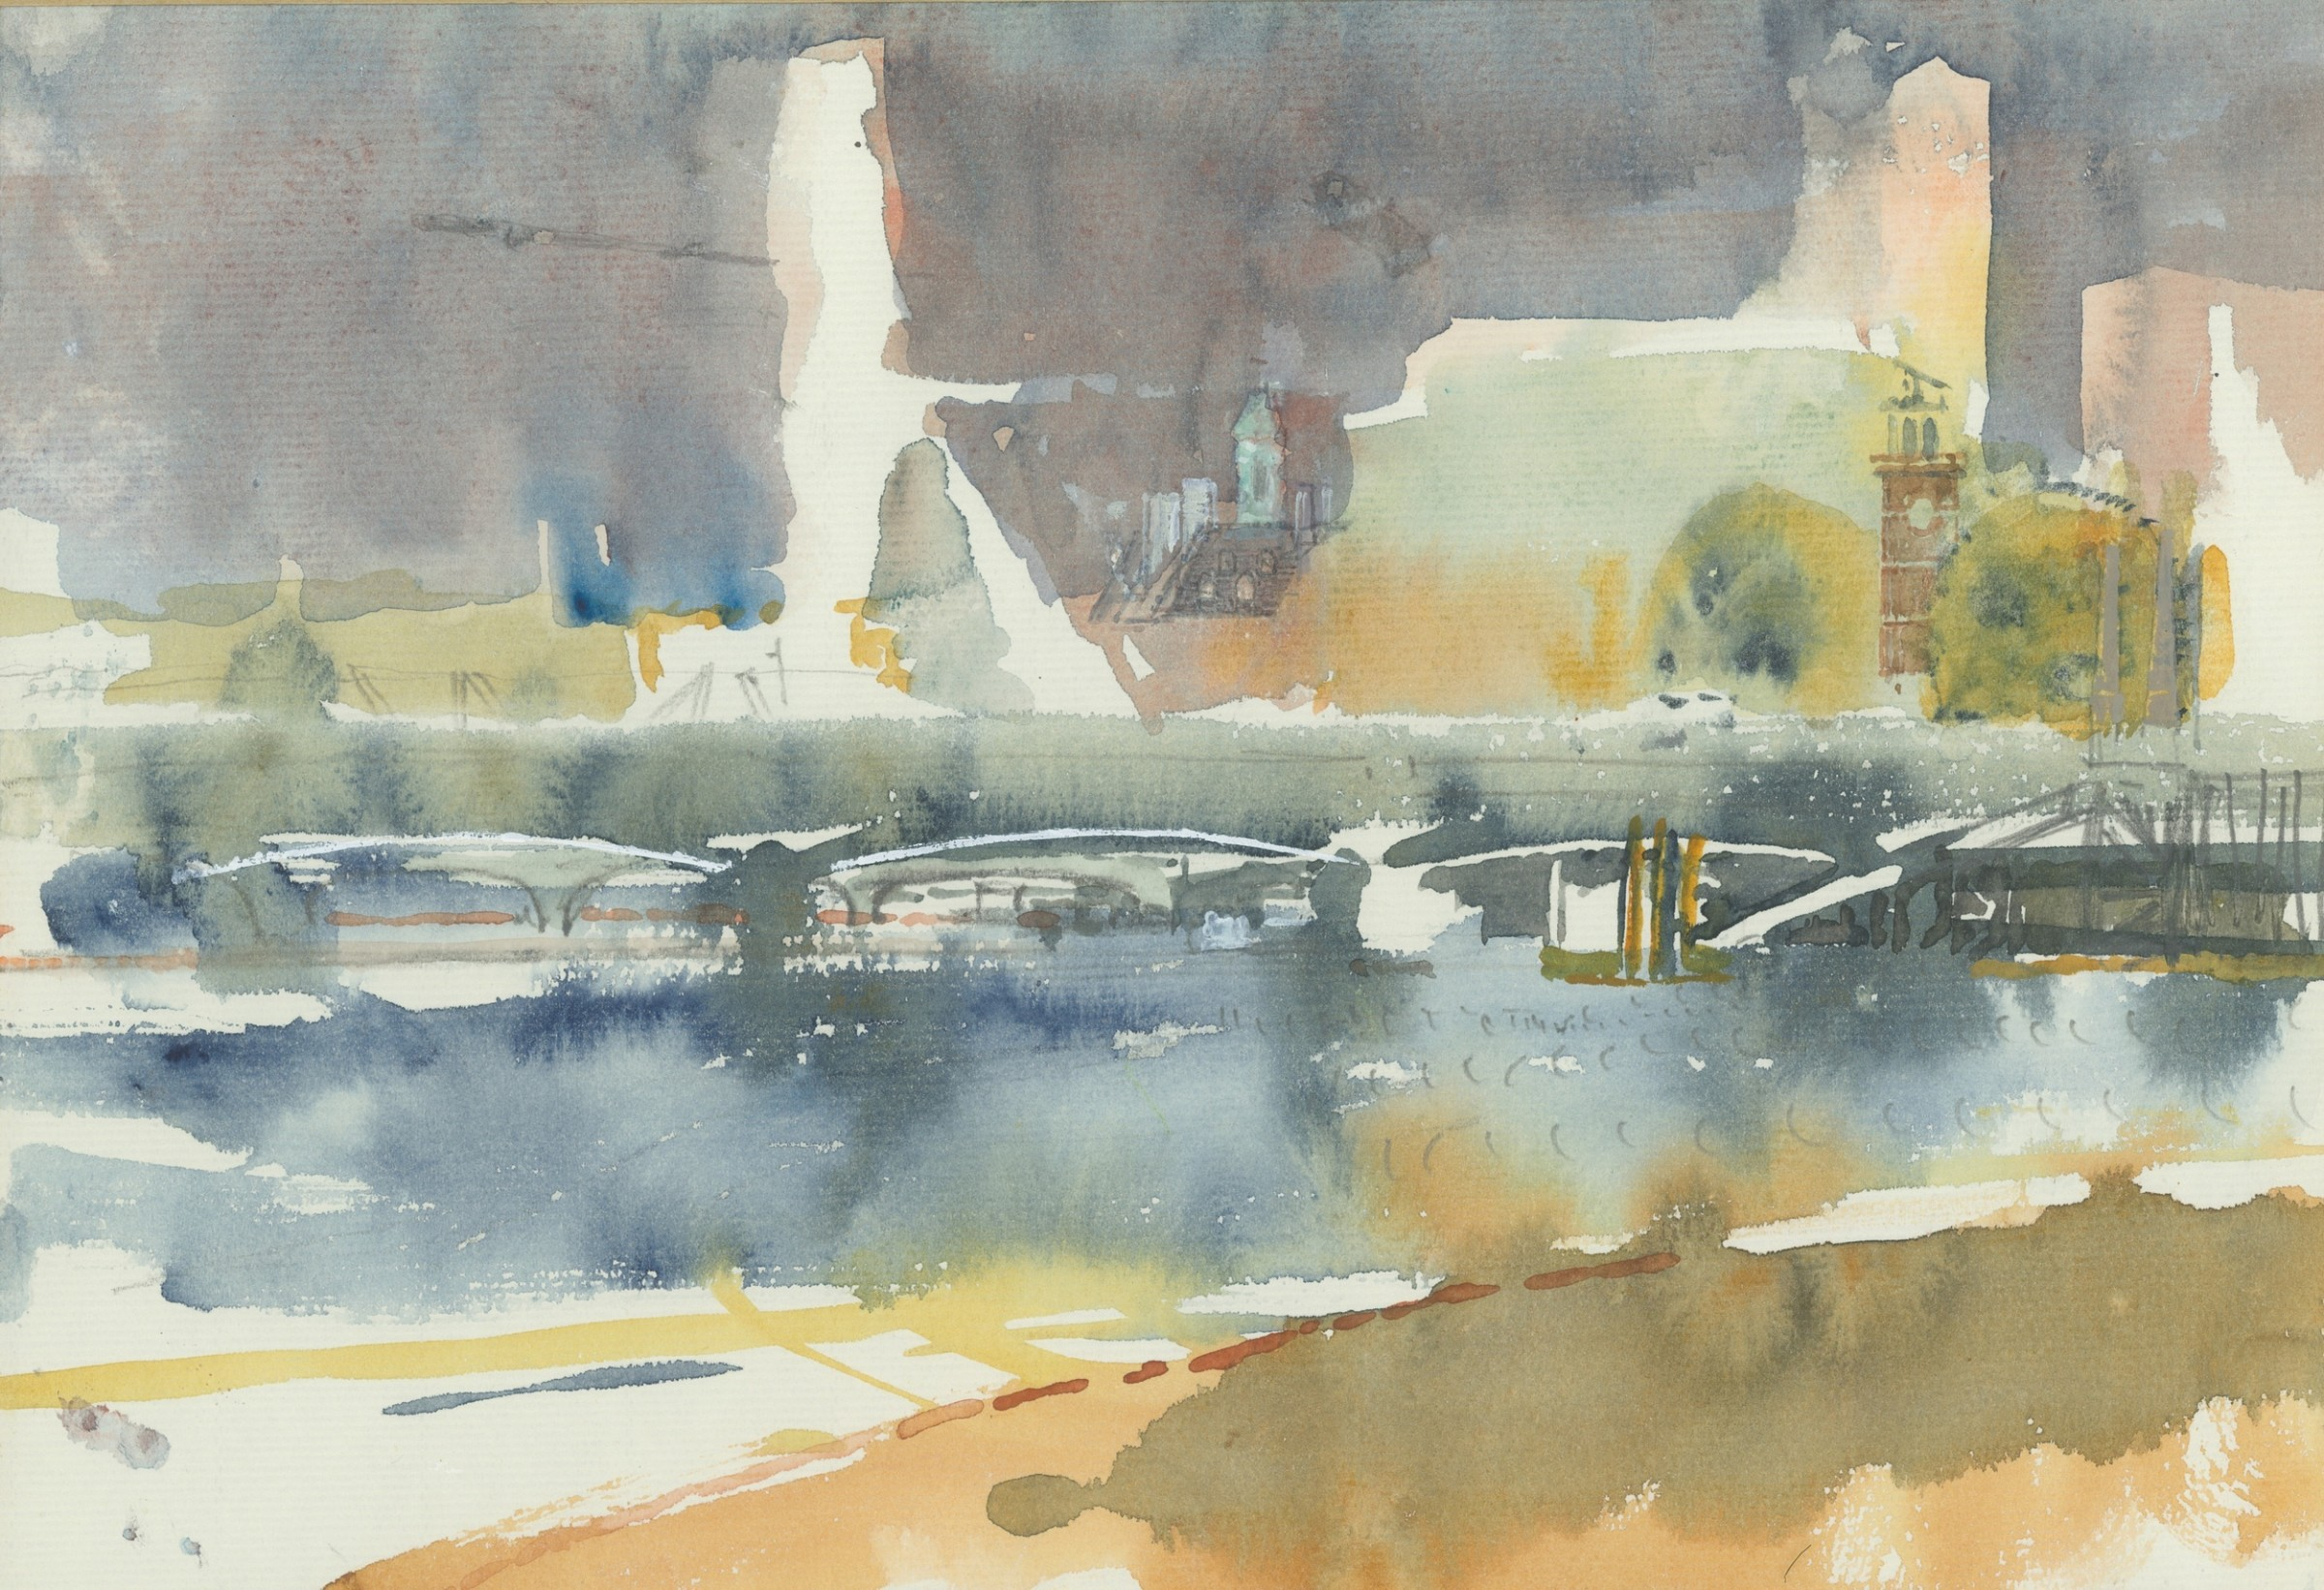 "<span class=""link fancybox-details-link""><a href=""/artists/87-paul-newland/works/11333-paul-newland-bright-river/"">View Detail Page</a></span><div class=""artist""><span class=""artist""><strong>Paul Newland</strong></span></div><div class=""title""><em>Bright River</em></div><div class=""medium"">watercolour</div><div class=""dimensions"">40x50cm</div><div class=""price"">£450.00</div>"